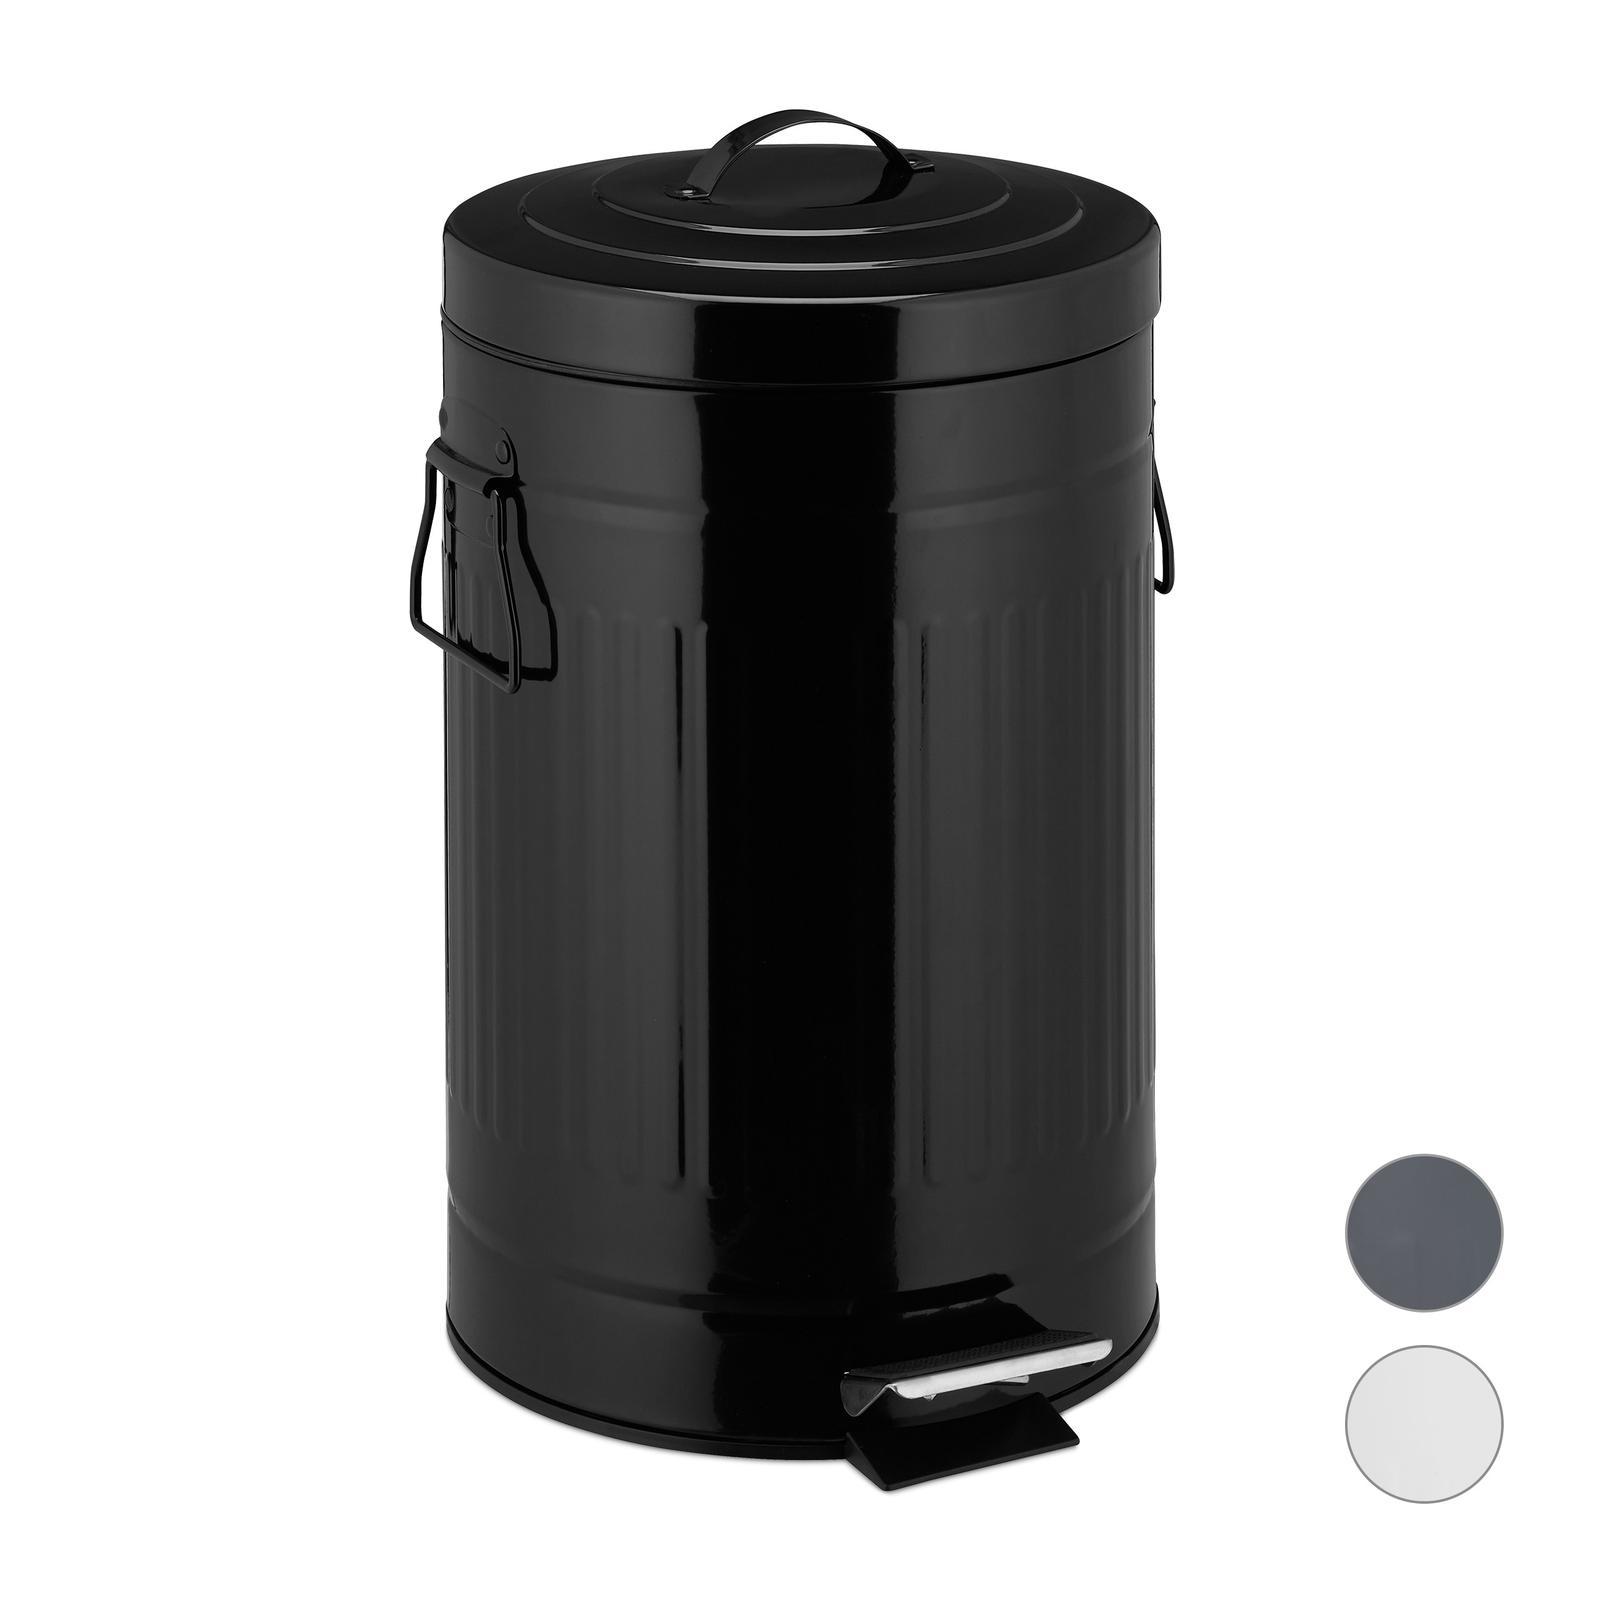 Odpadkový kôš Vintage 20L čierny, RD5613 - Obrázok č. 1